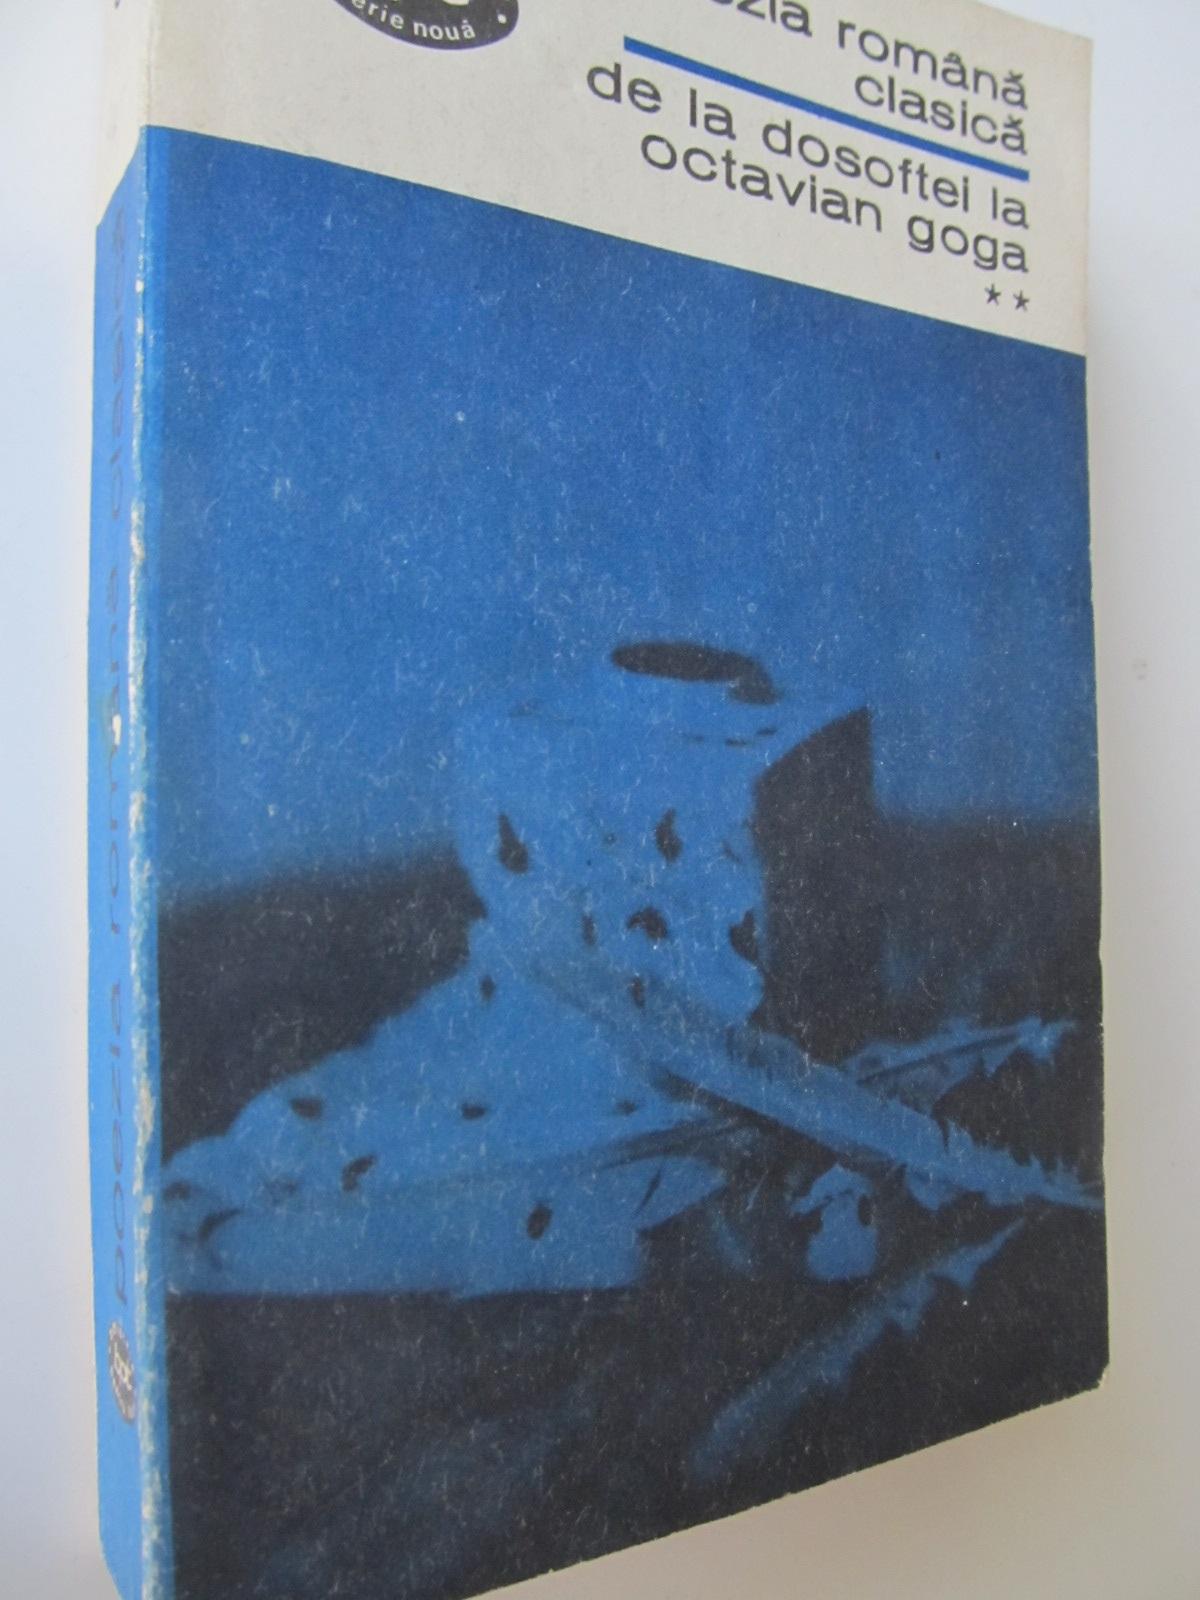 Carte Poezia romana claaica - De la Dosoftei la Octavian Goga (vol. 2) - ***